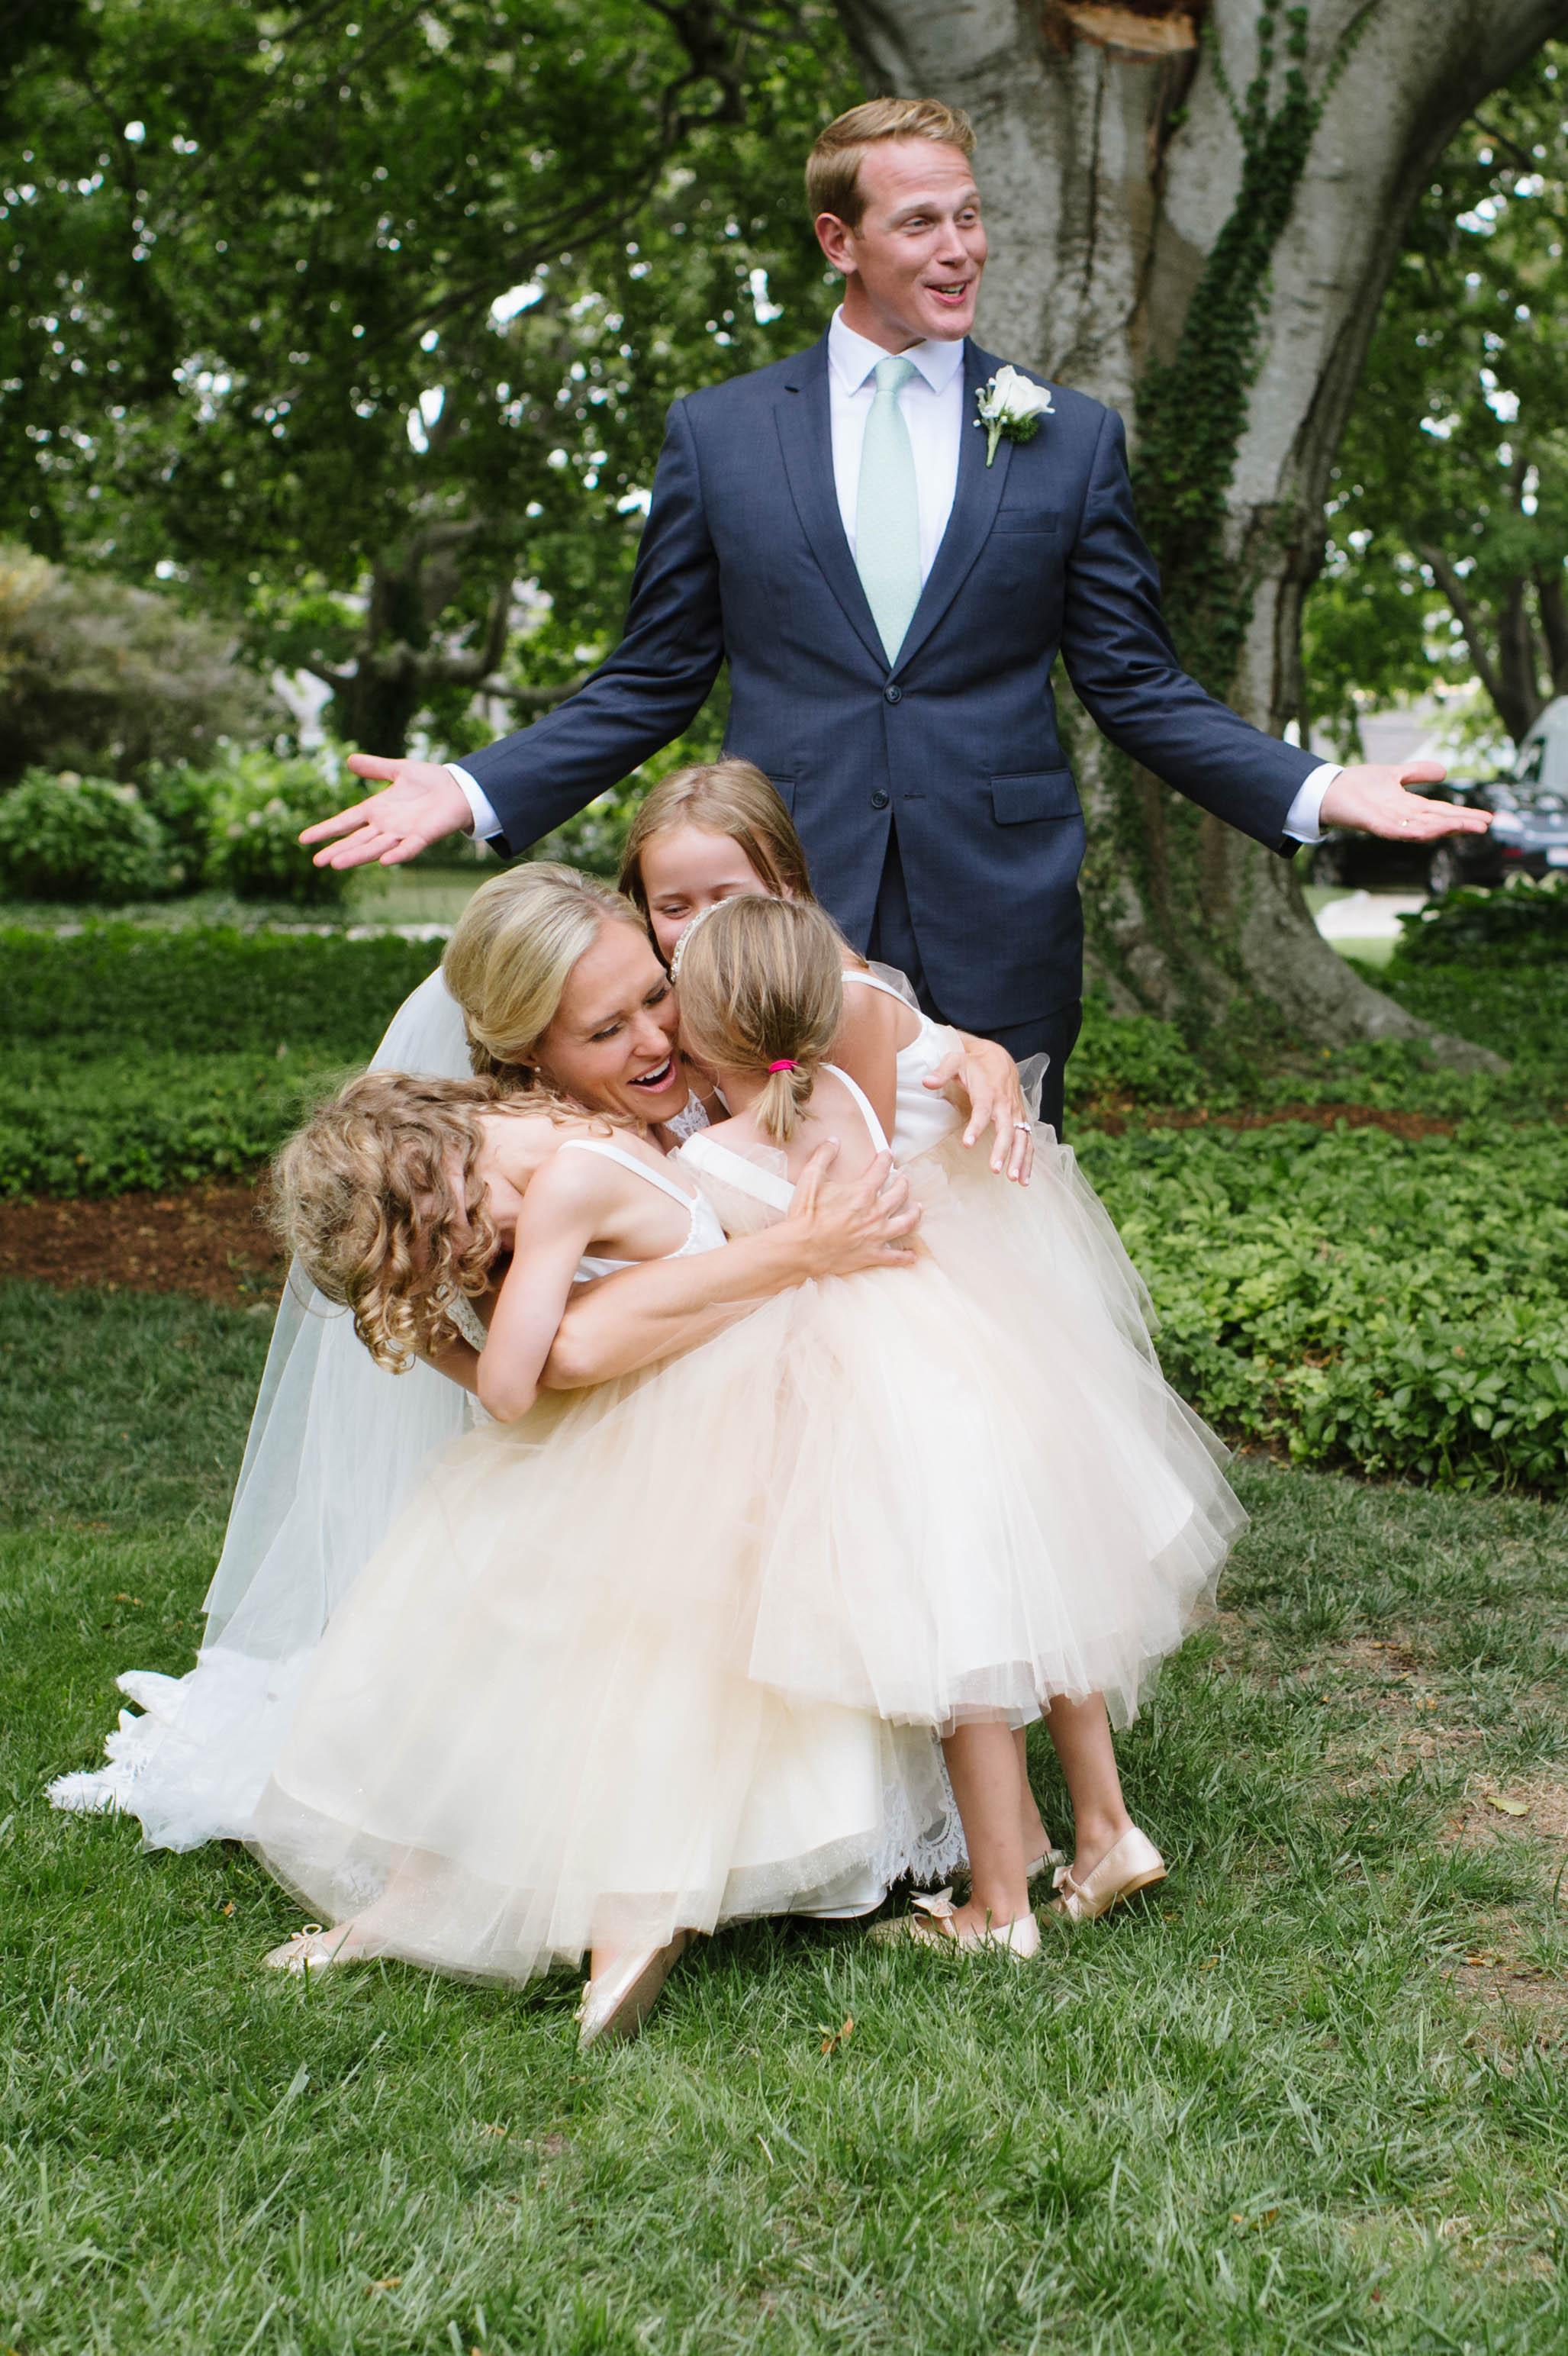 Candid-Wedding-Photography002.jpg